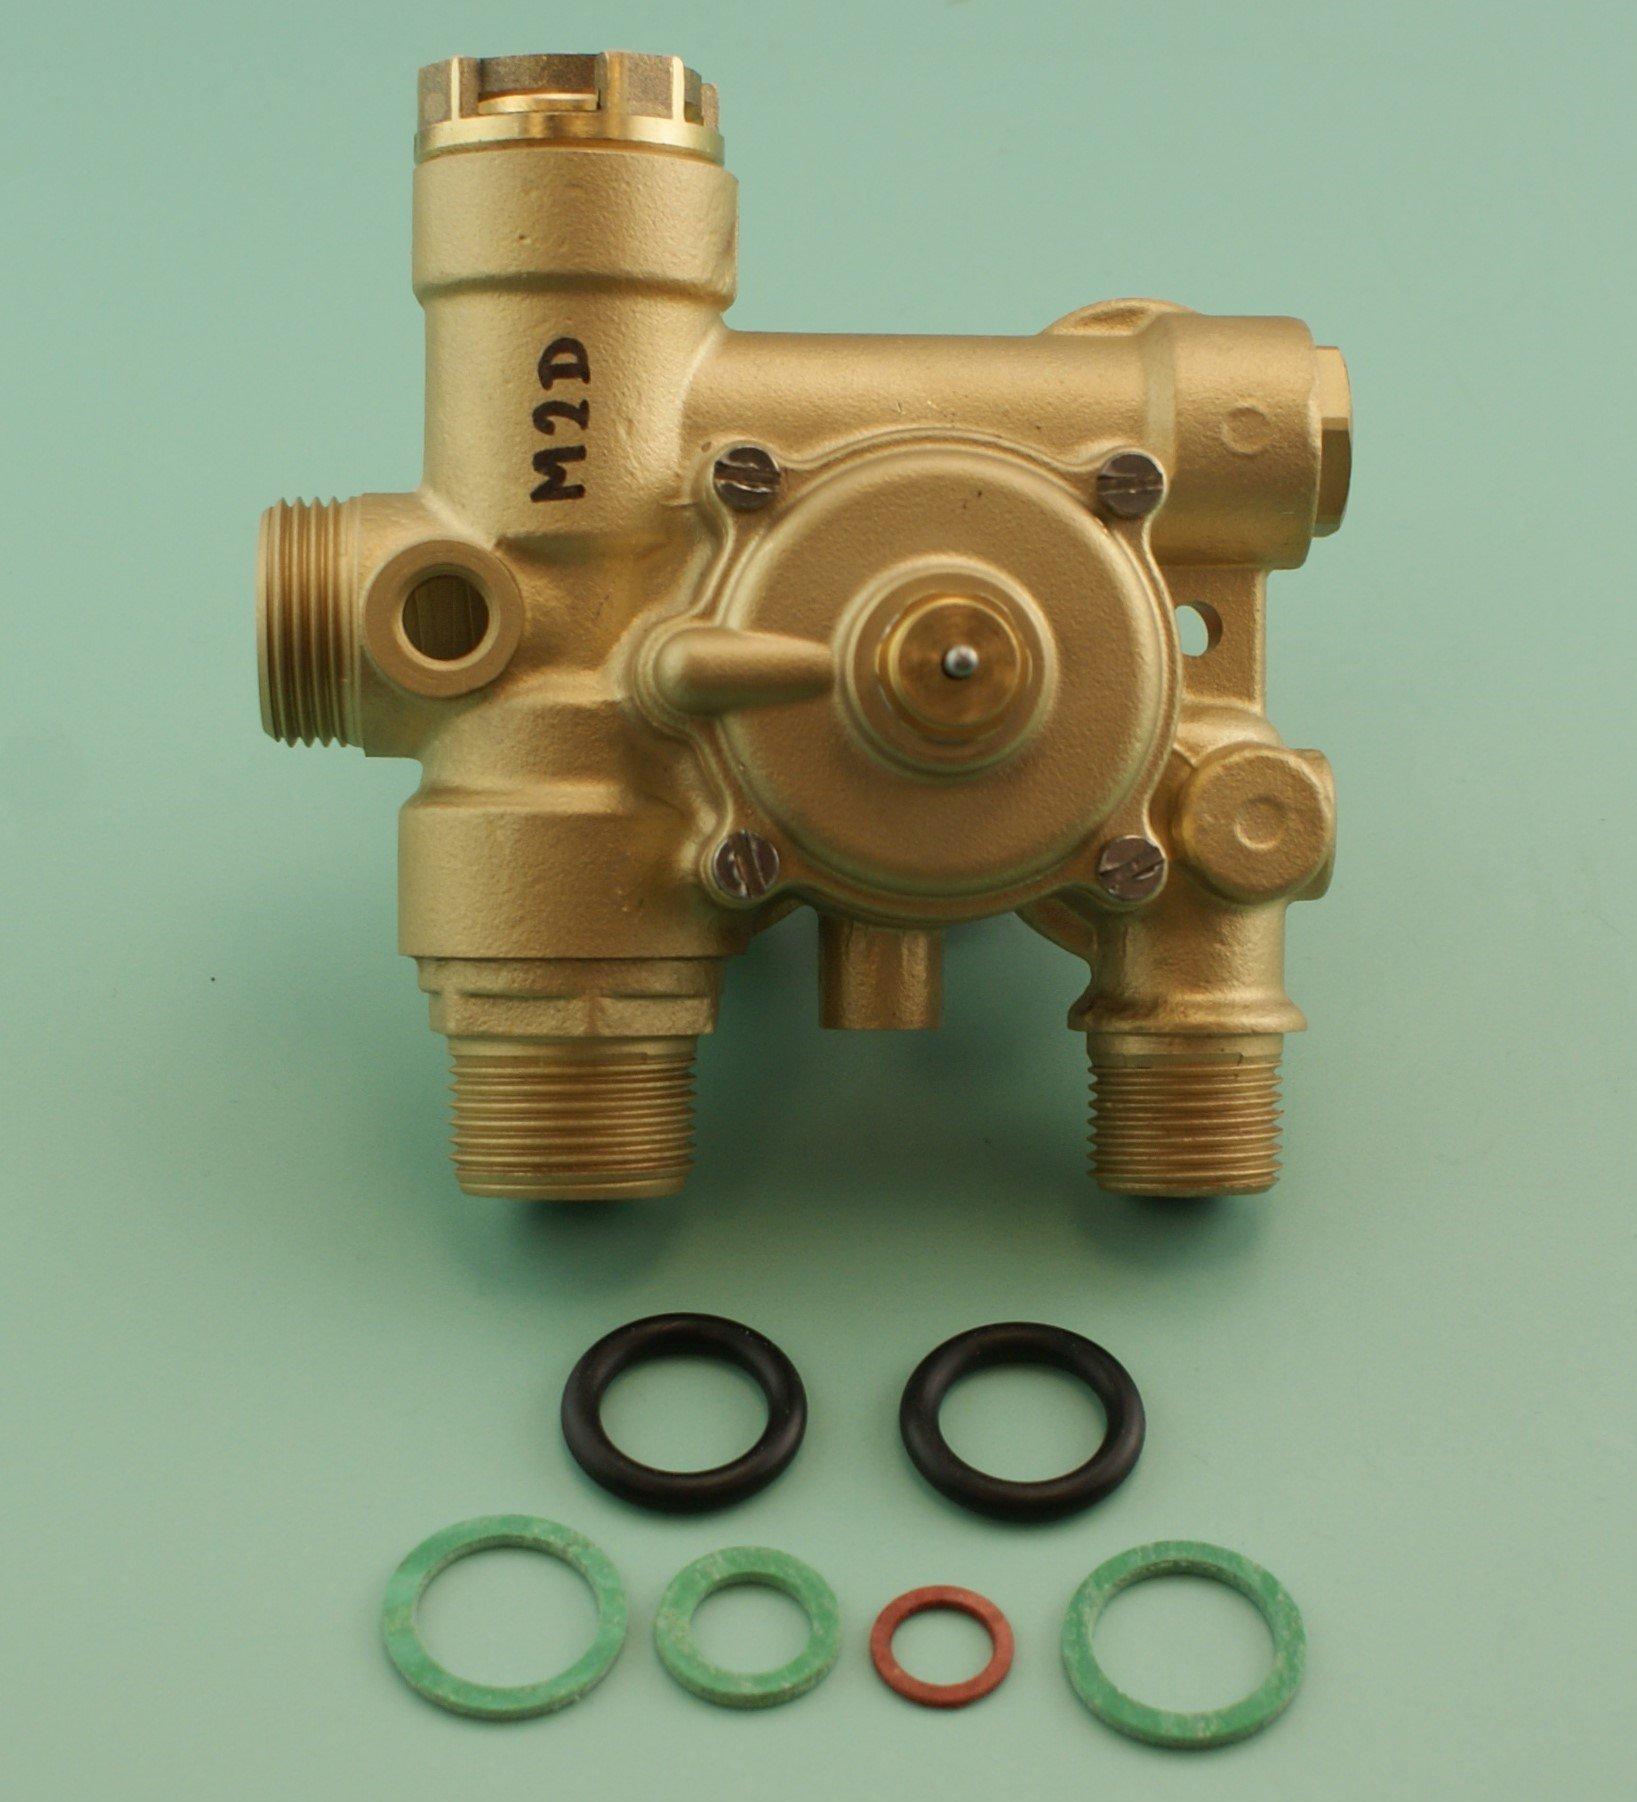 Ideal diverter valve